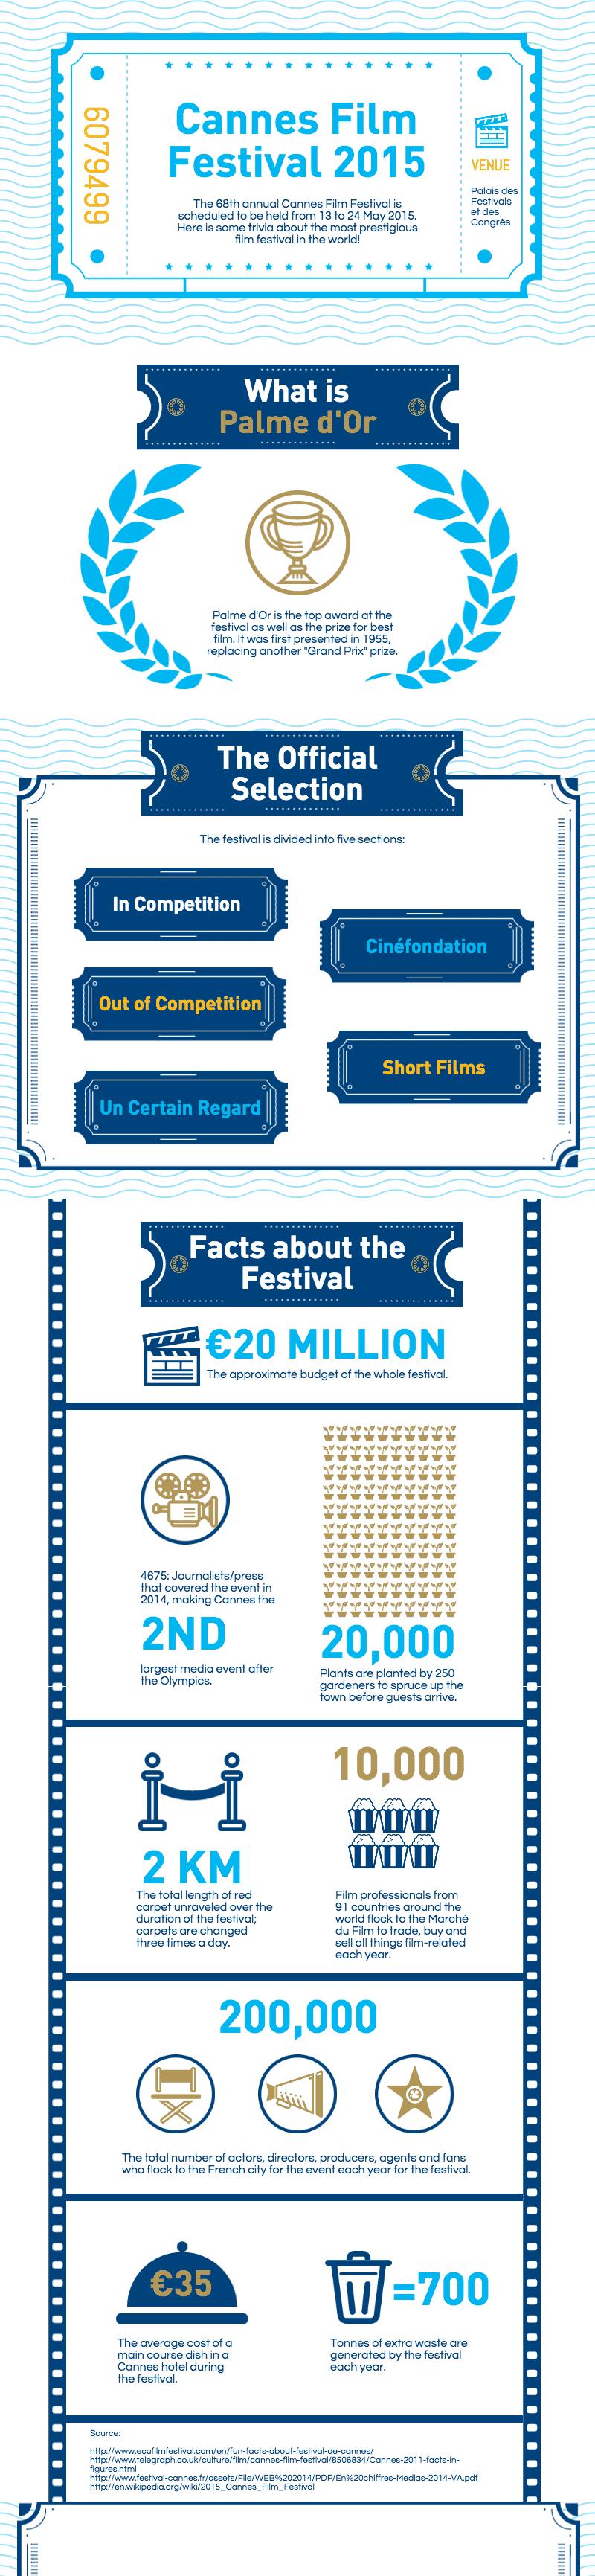 cannes-film-festival-2015-9066877